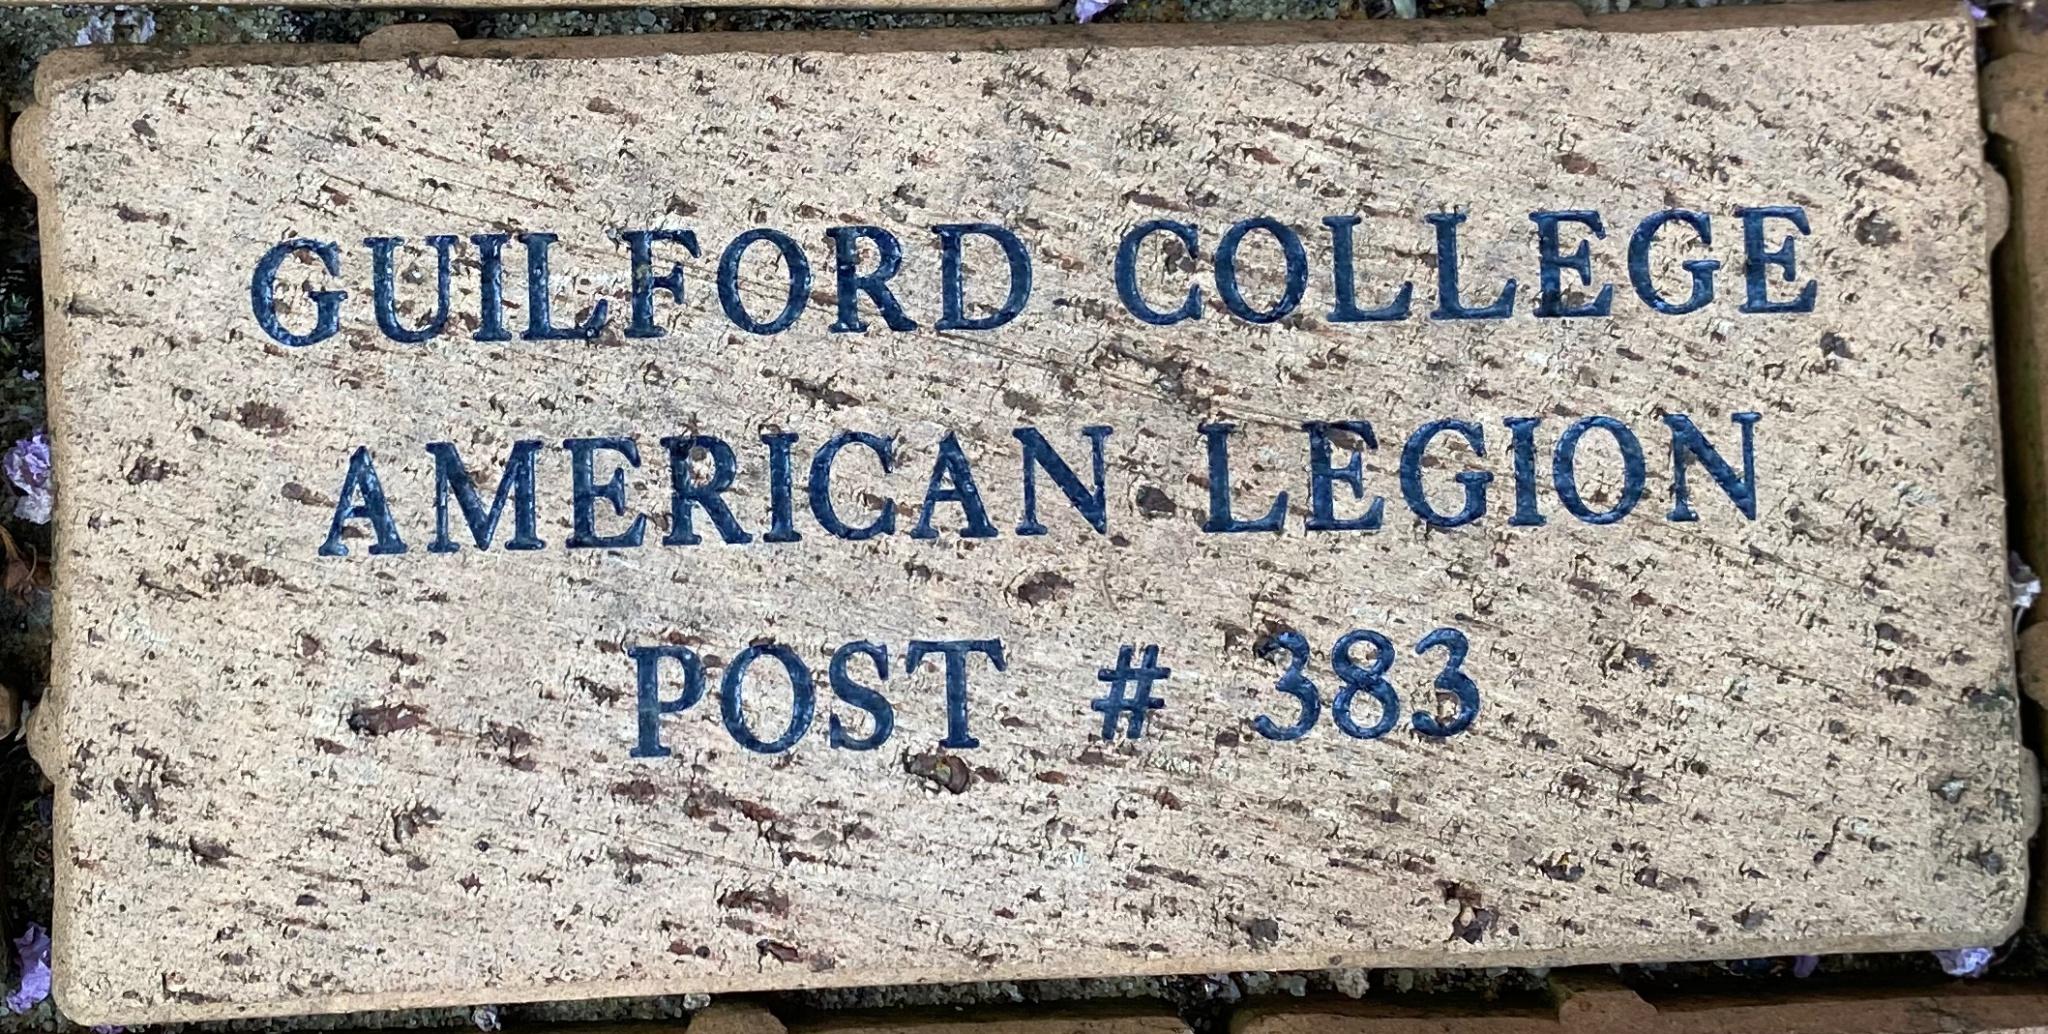 GUILFORD COLLEGE  AMERICAN LEGION POST # 383